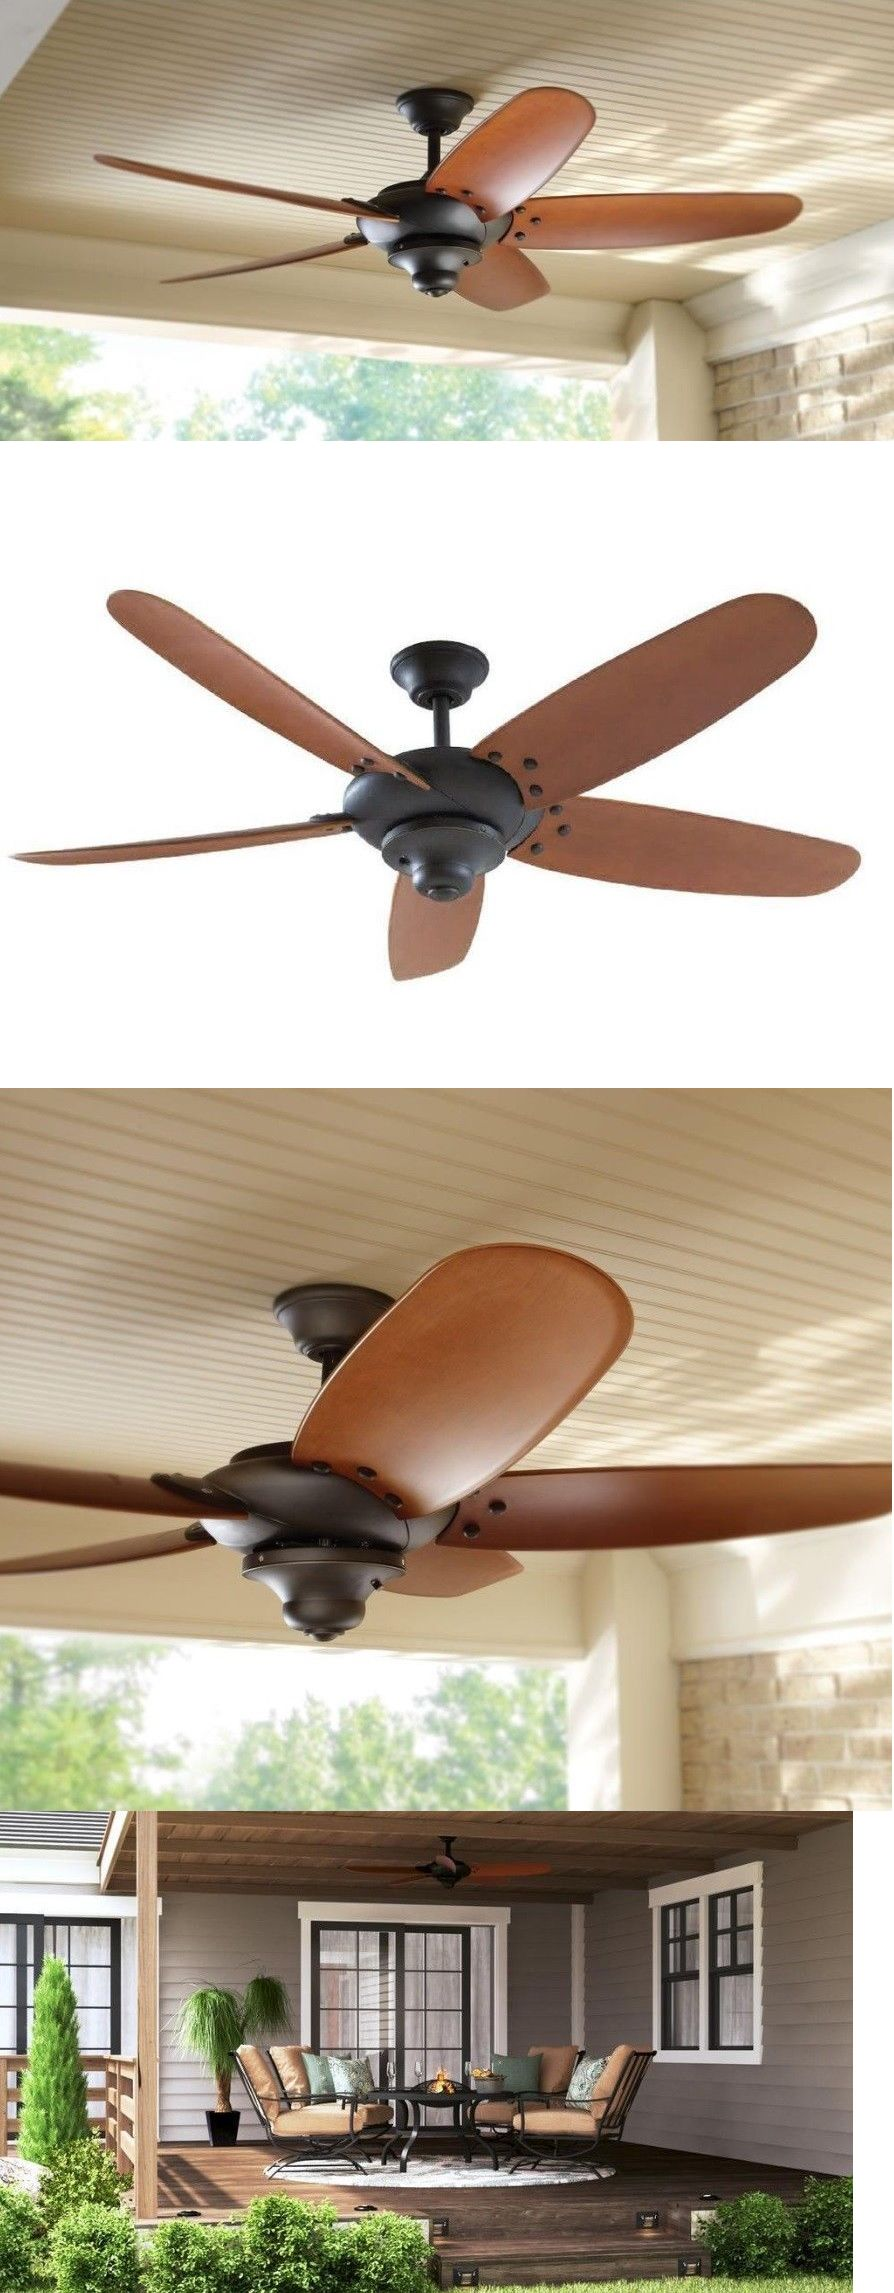 Ceiling Fans 176937 Home Decorators Collection 26660 Altura 60 In Indoor Outdoor Oil Rubbed Bronze Buy It Now Only 149 95 Ceiling Fan Ceiling Fans For Sale Bronze Ceiling Fan